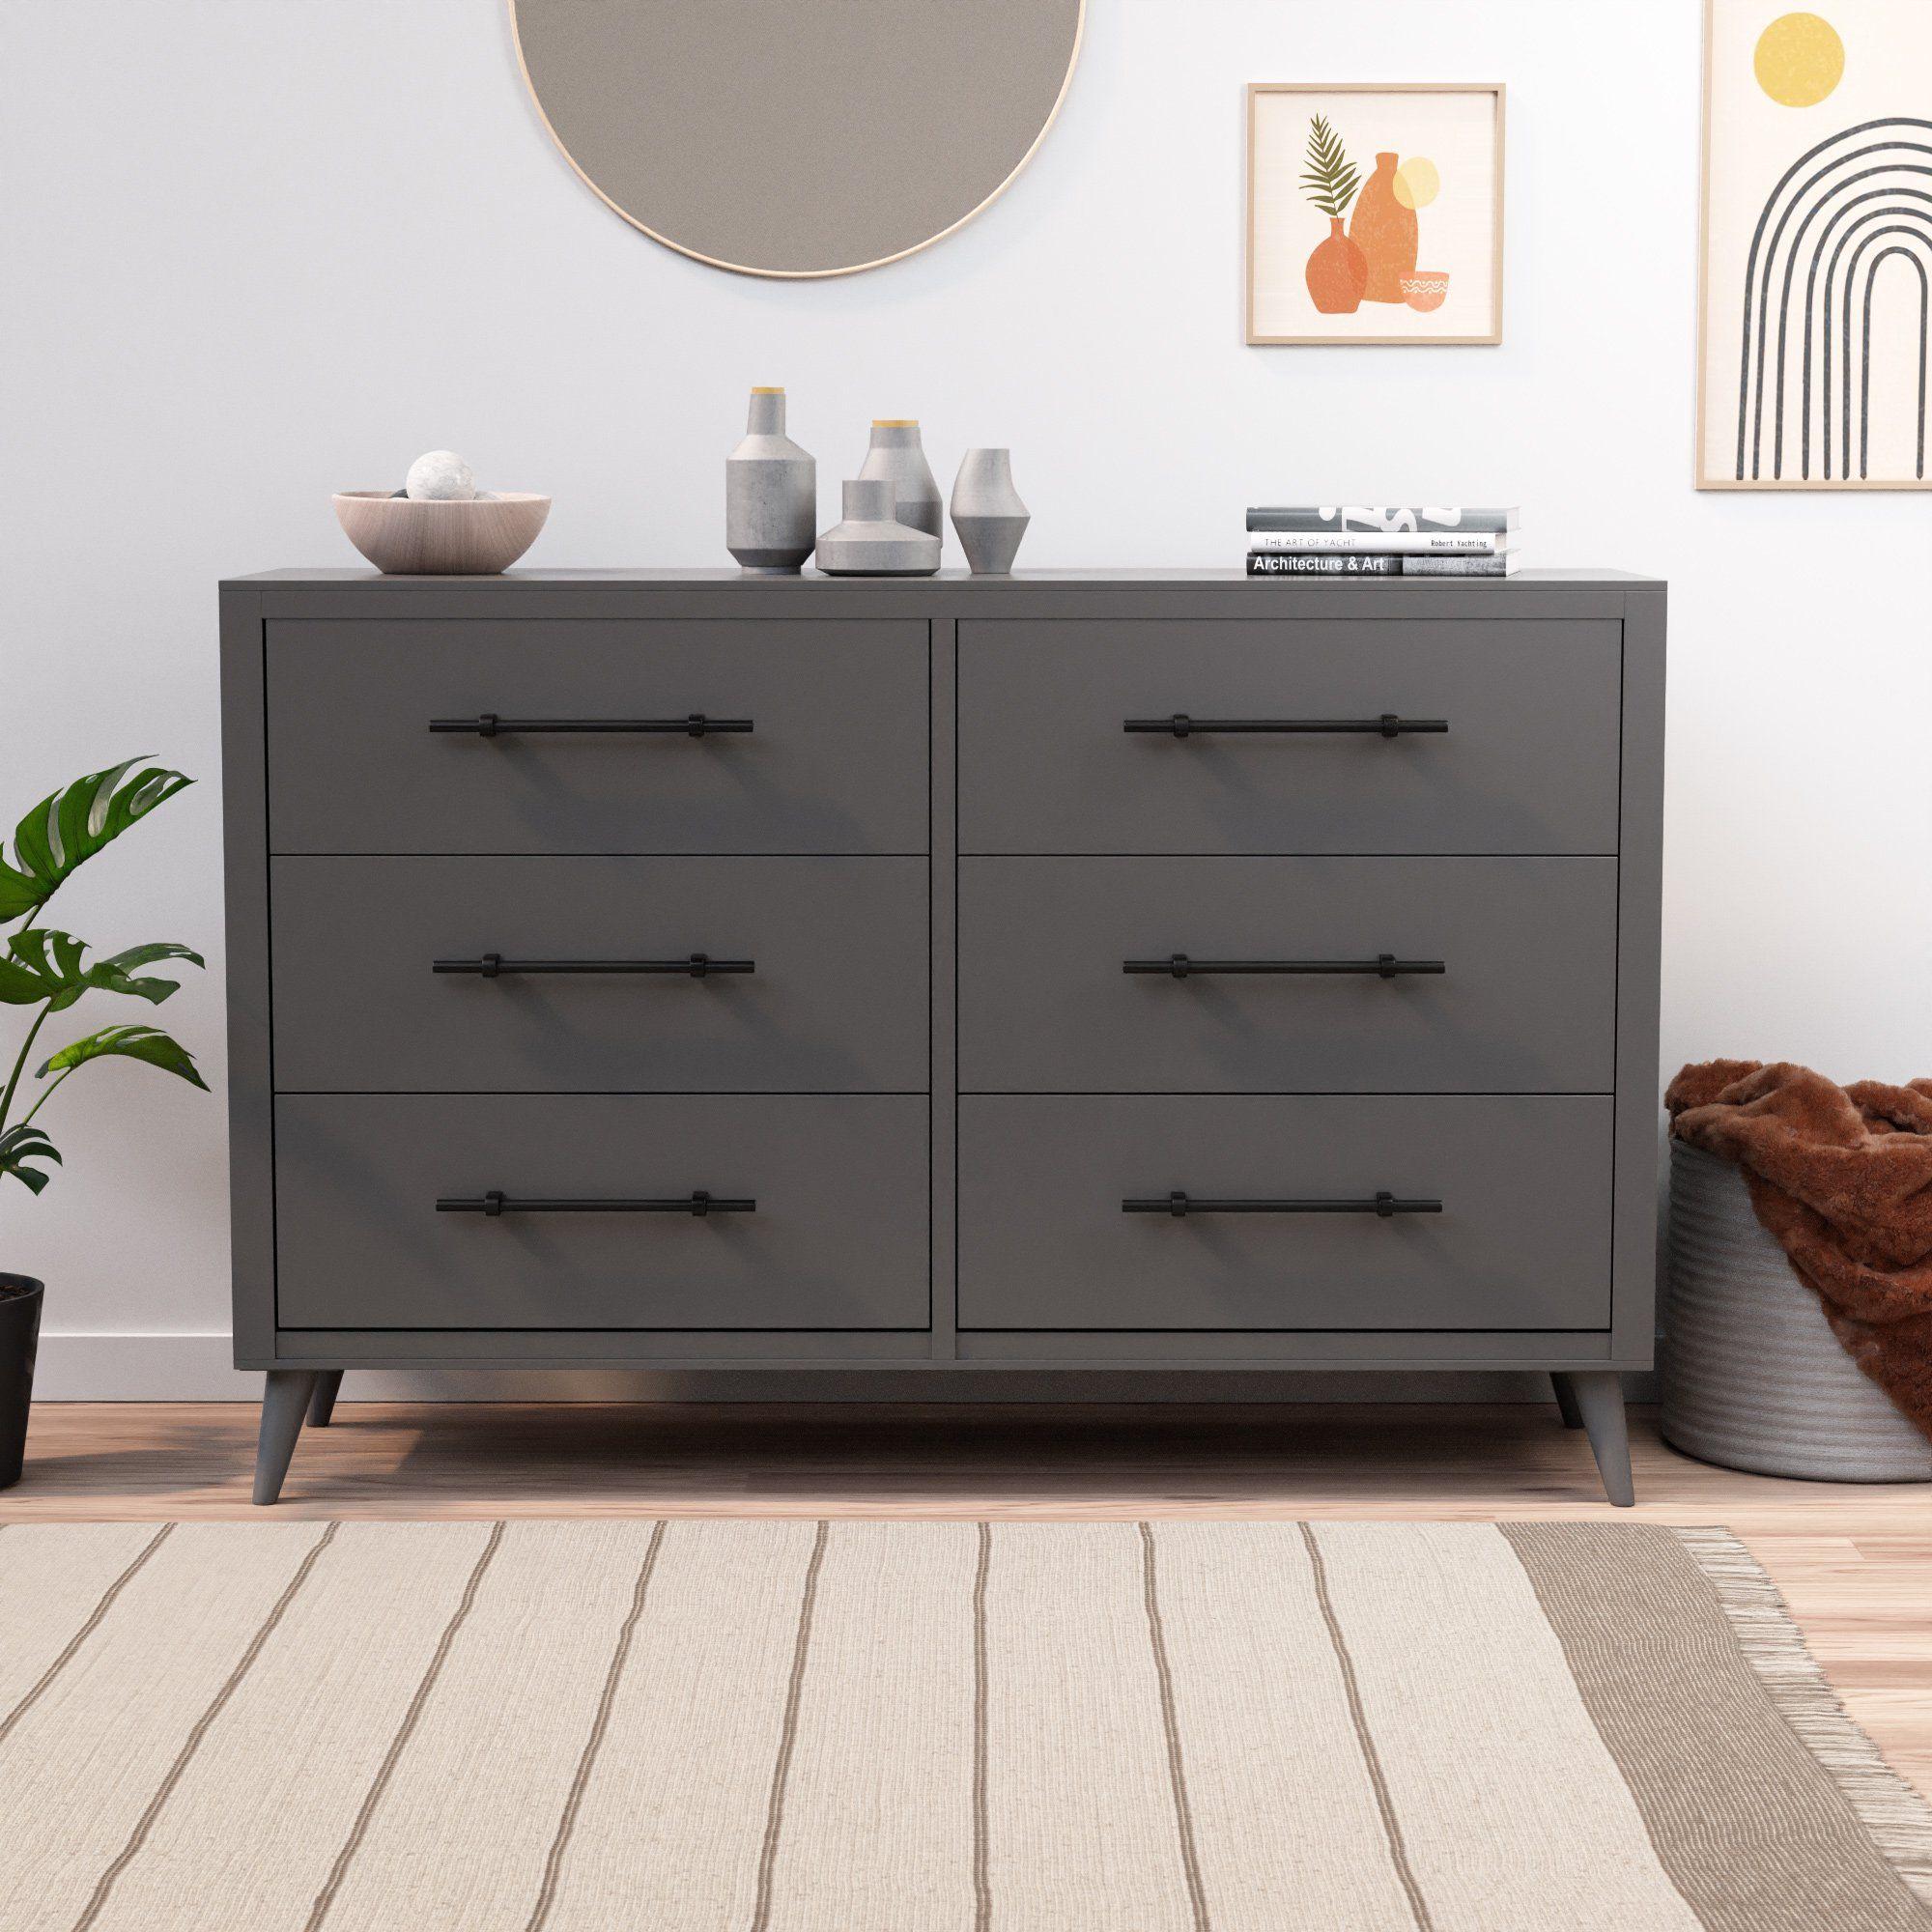 Rest Haven Mid Century Modern 6 Drawer Dresser Gray Walmart Com In 2021 Black Dresser Bedroom Dresser Drawers 6 Drawer Dresser [ 2000 x 2000 Pixel ]